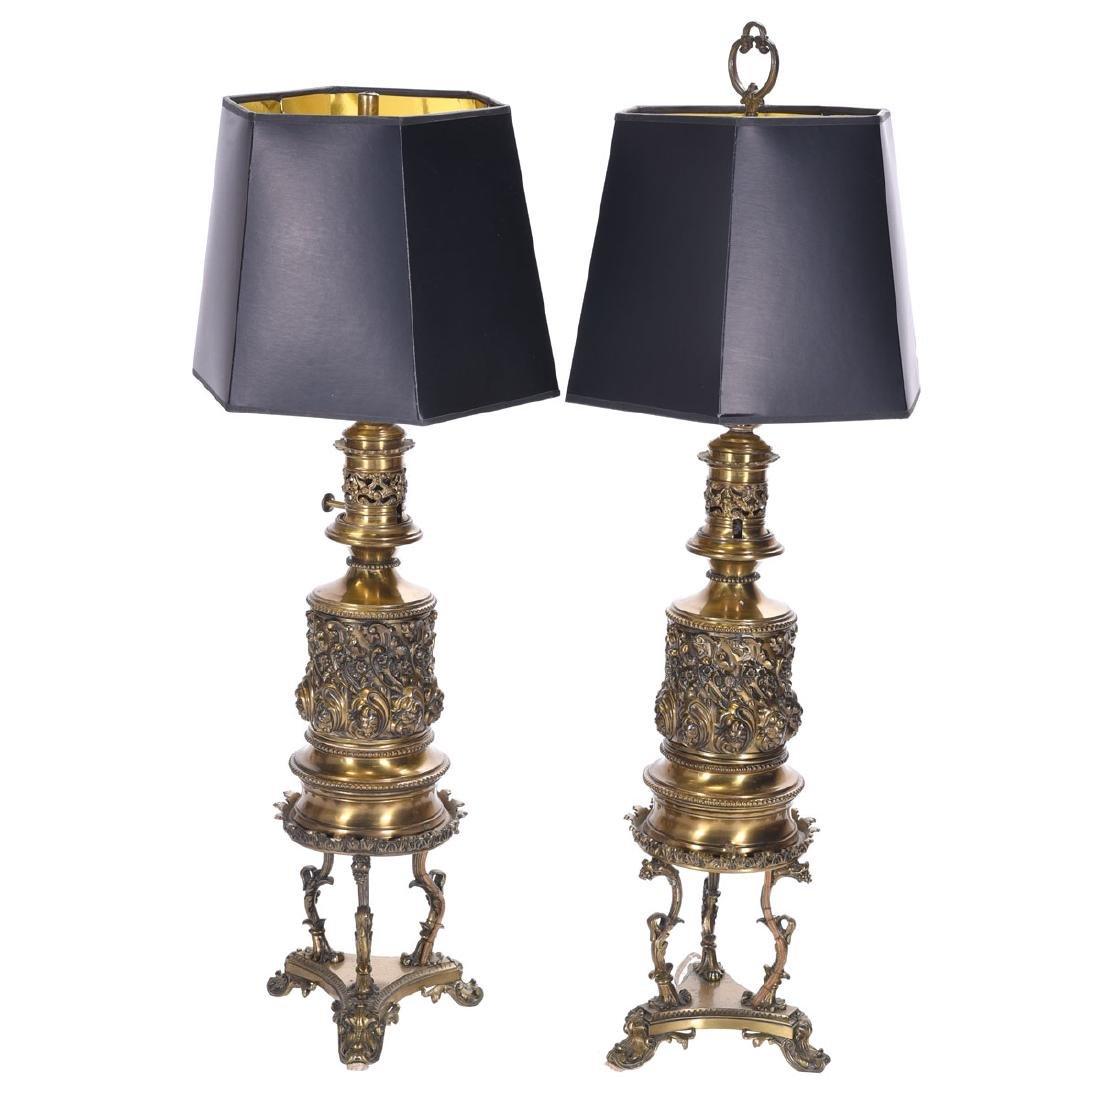 Pair of Renaissance Revival Gilt Metal Kerosene Lamps